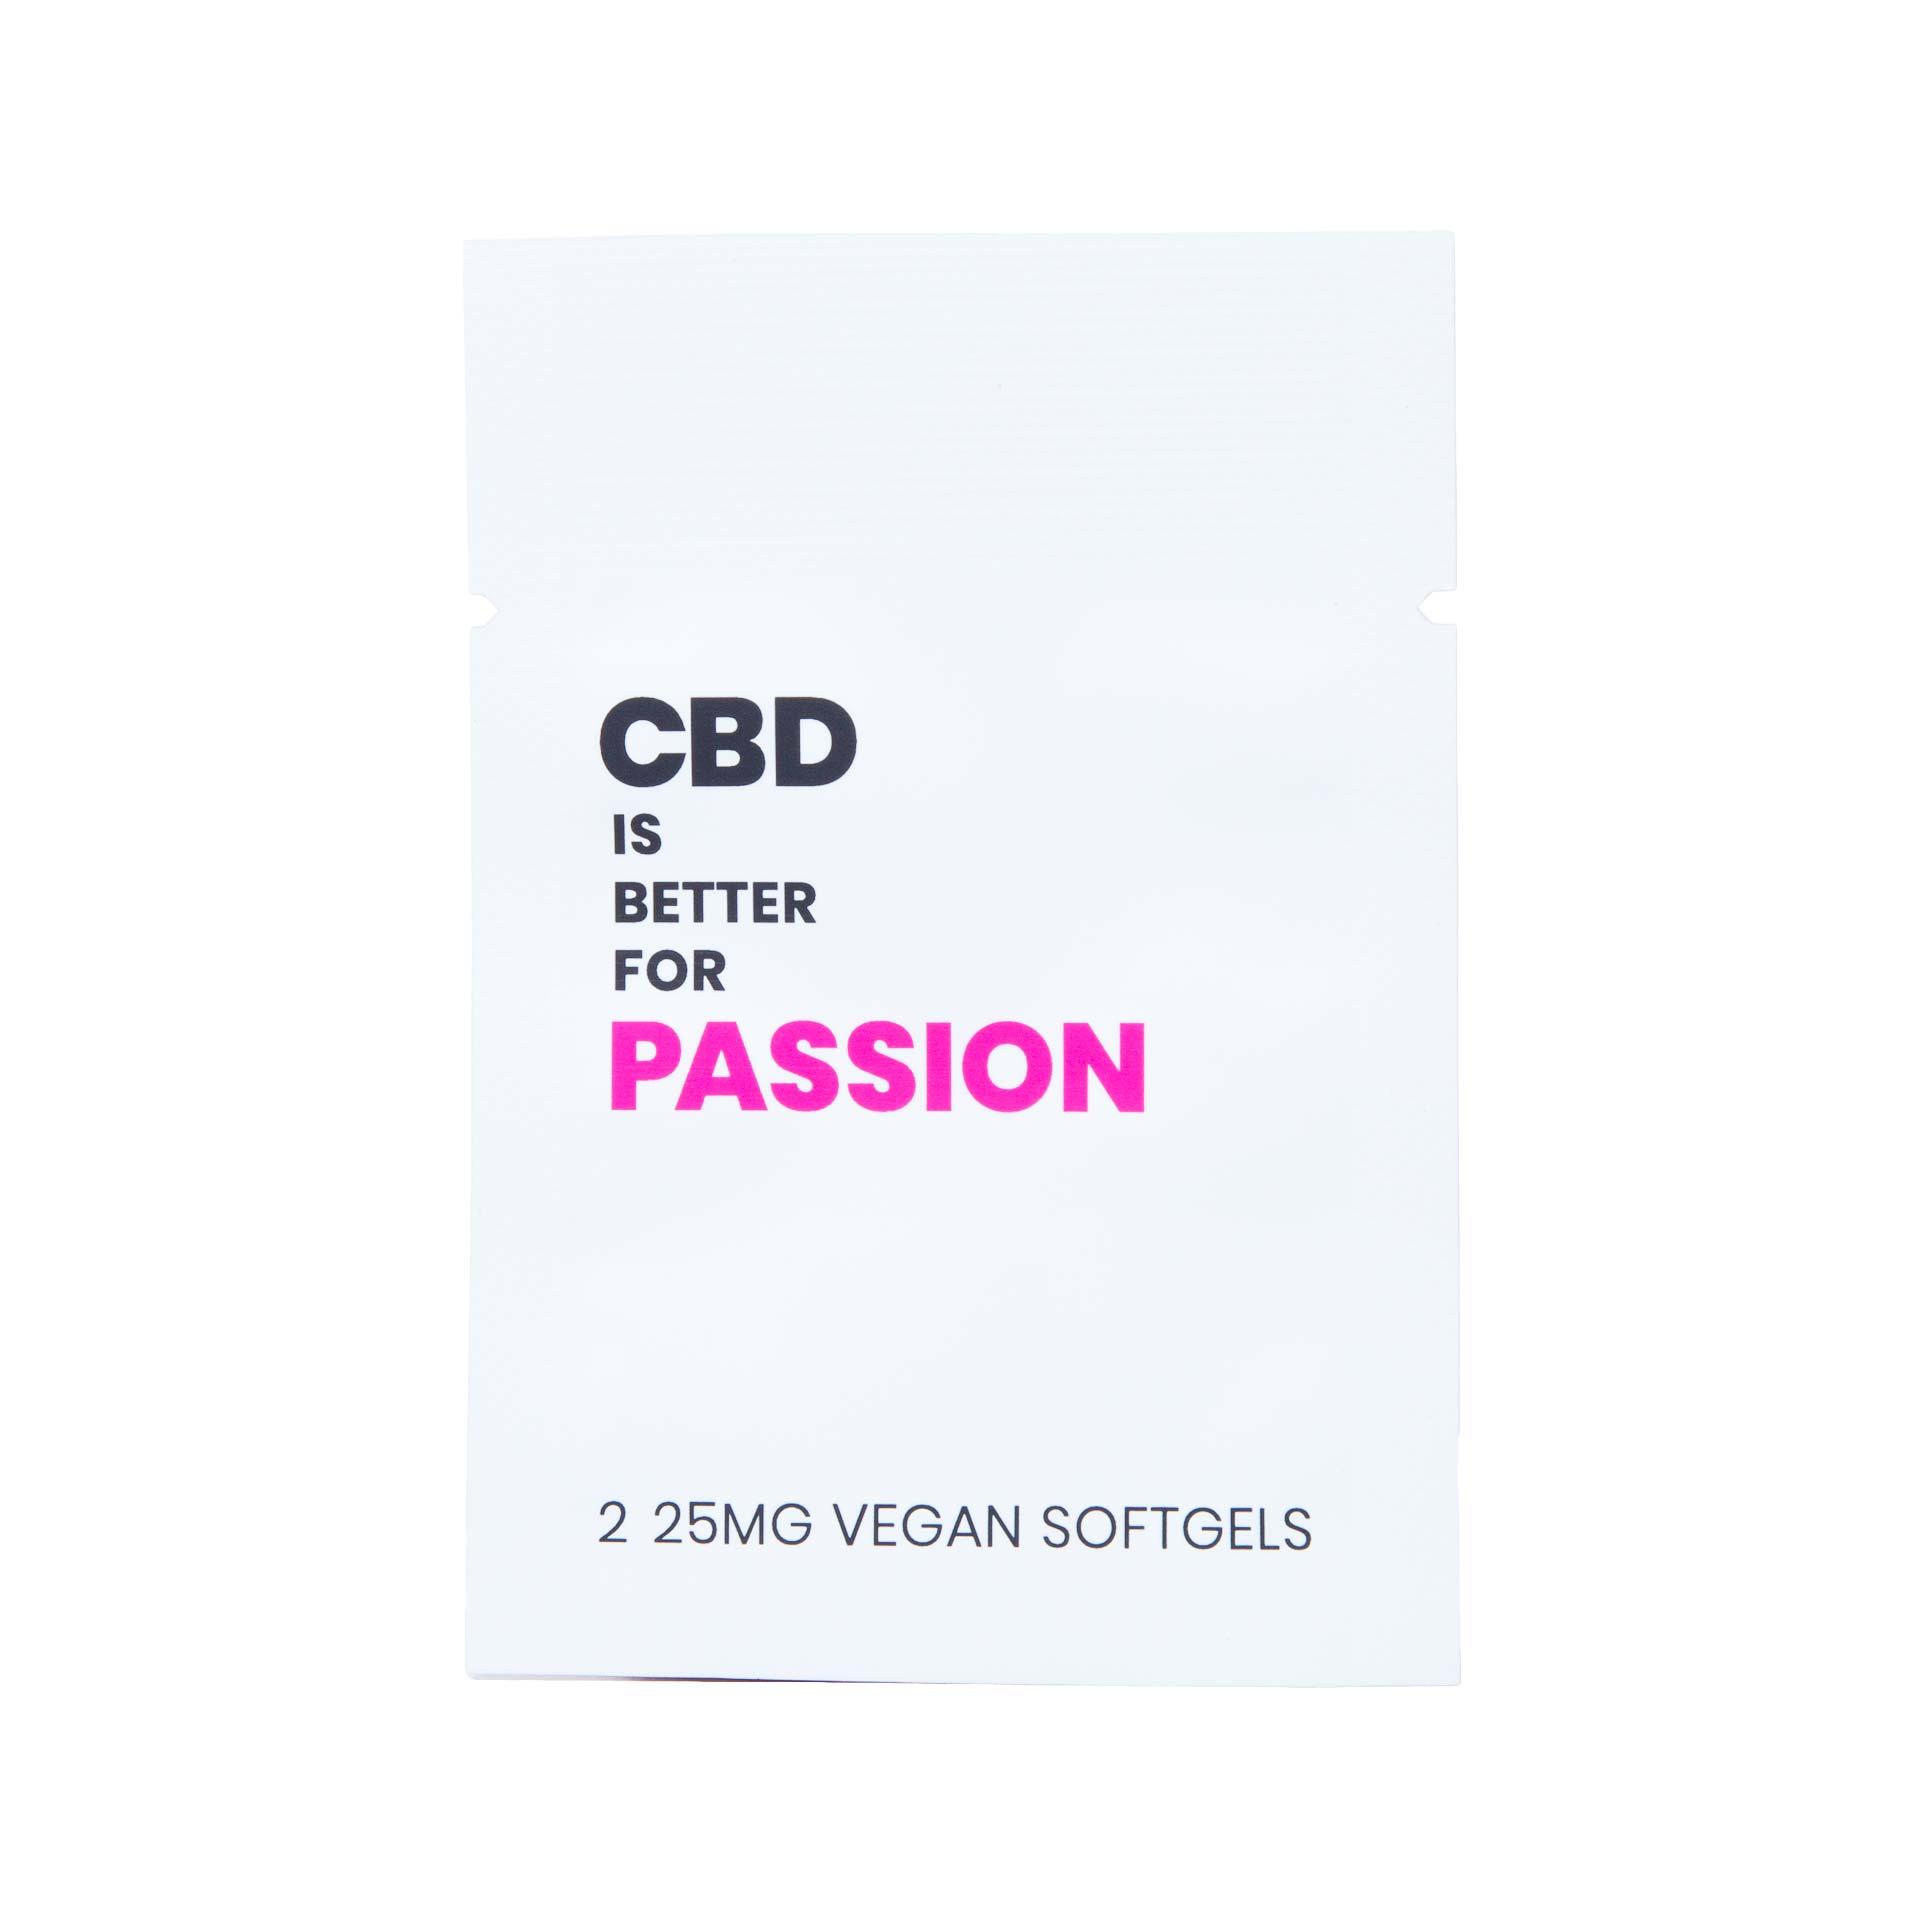 CBD IS BETTER FOR PASSION VEGAN CBD SOFTGELS 2-PILL PACKET